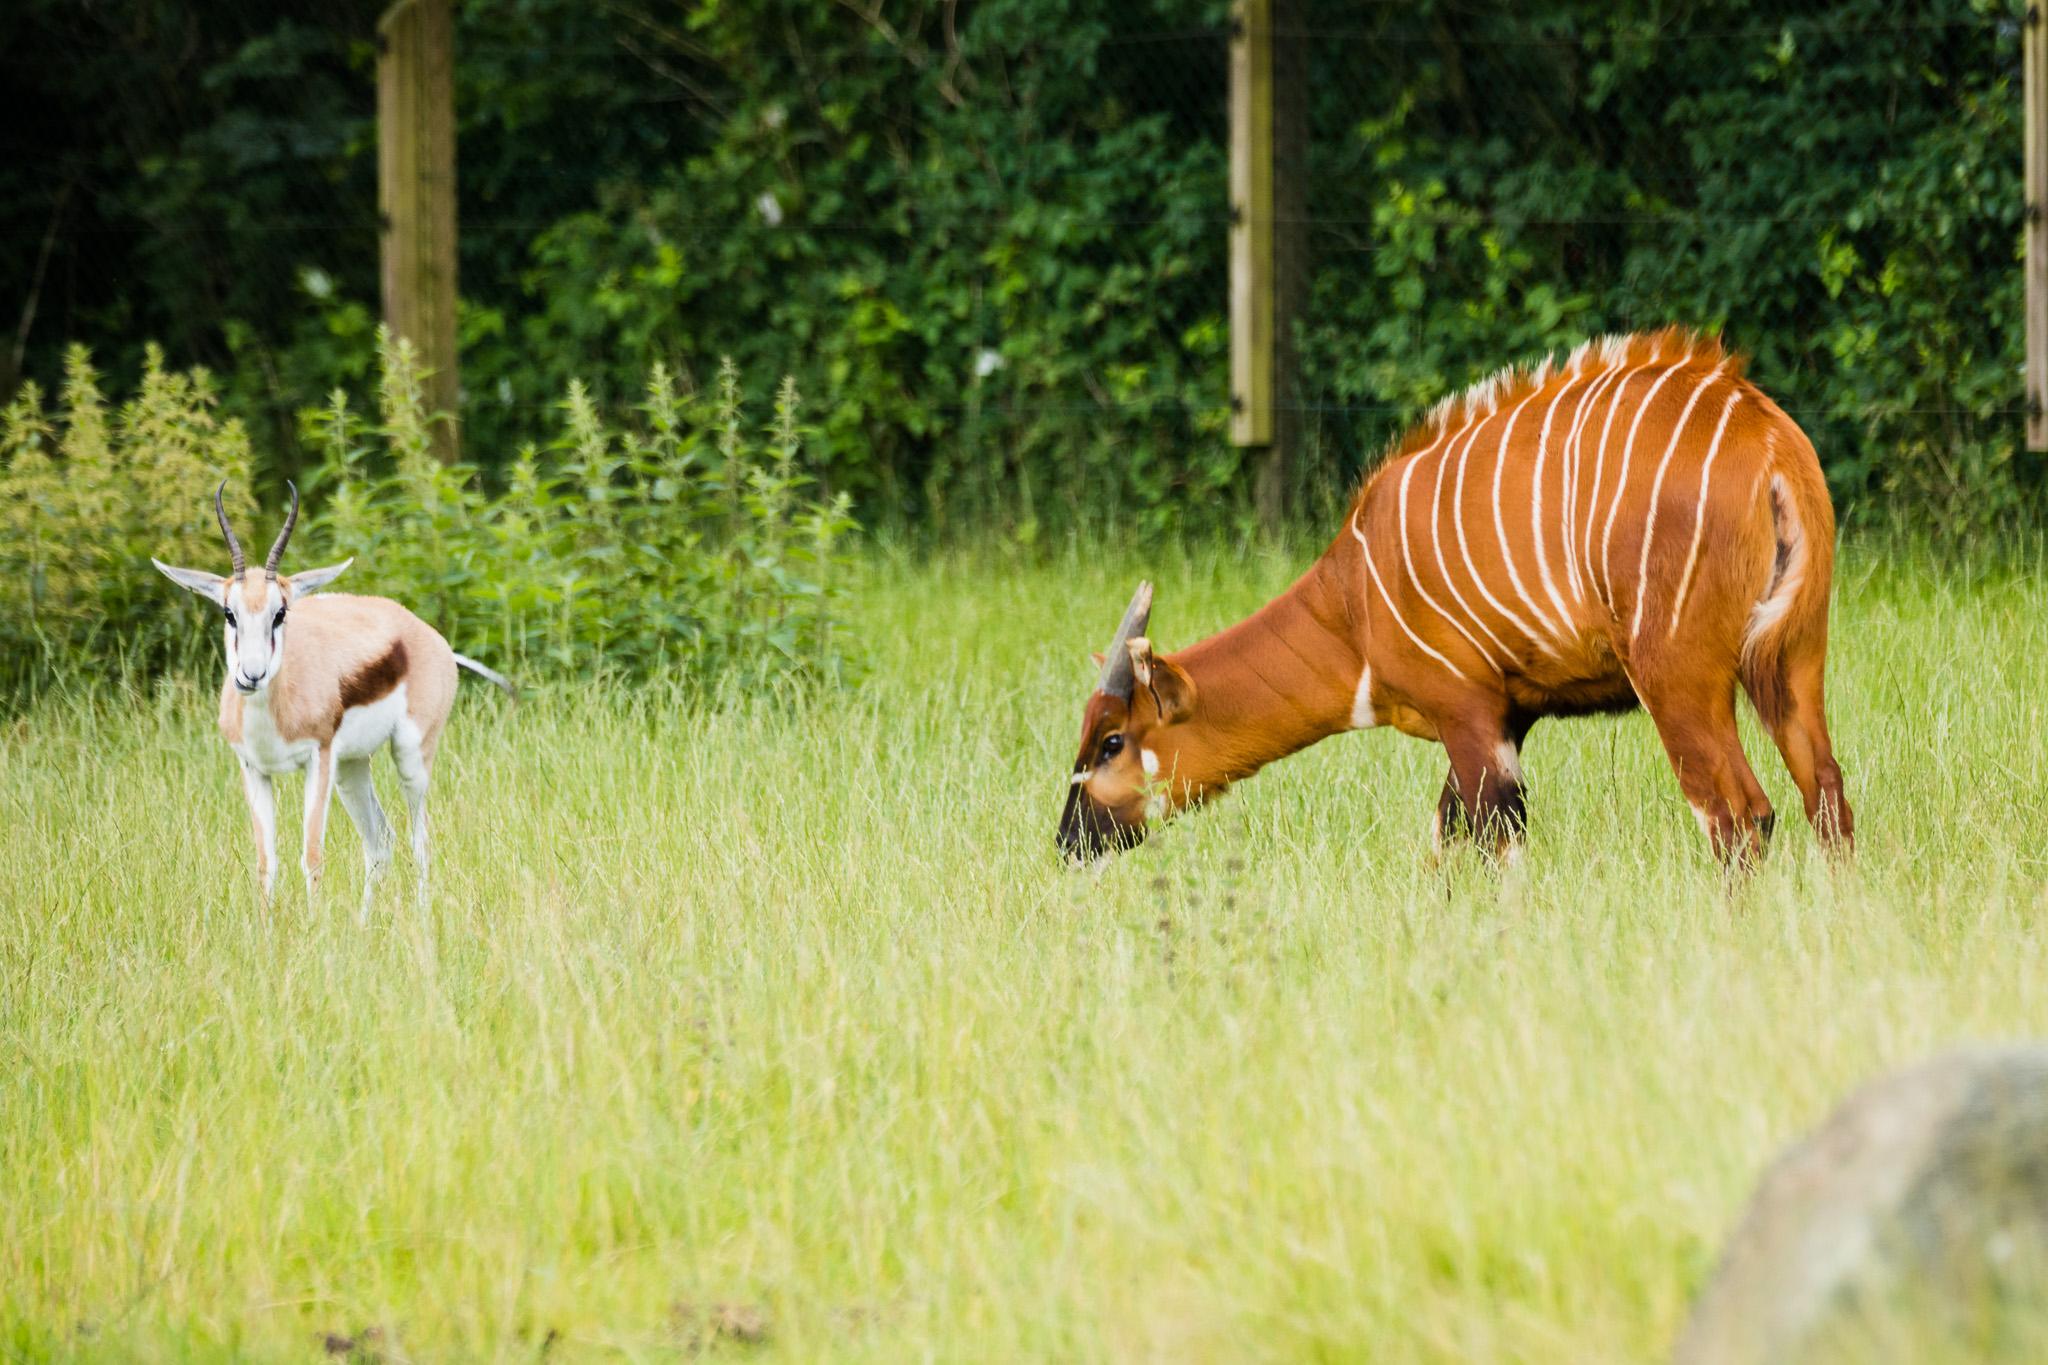 Givskud-Zoo-Safari-NorthernWorkshops-6.jpg